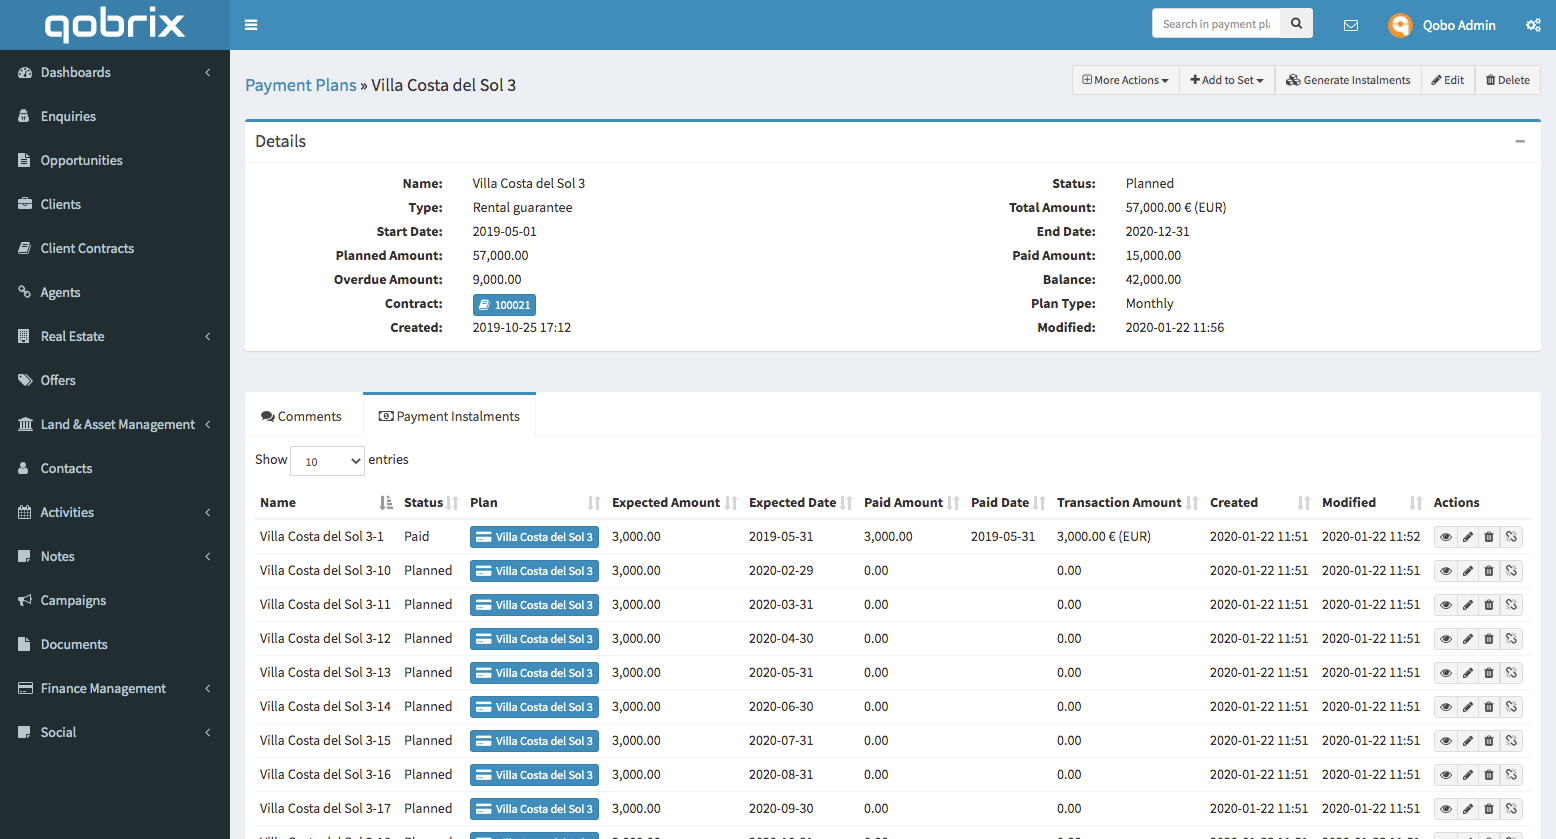 Qobrix Finance Management Module